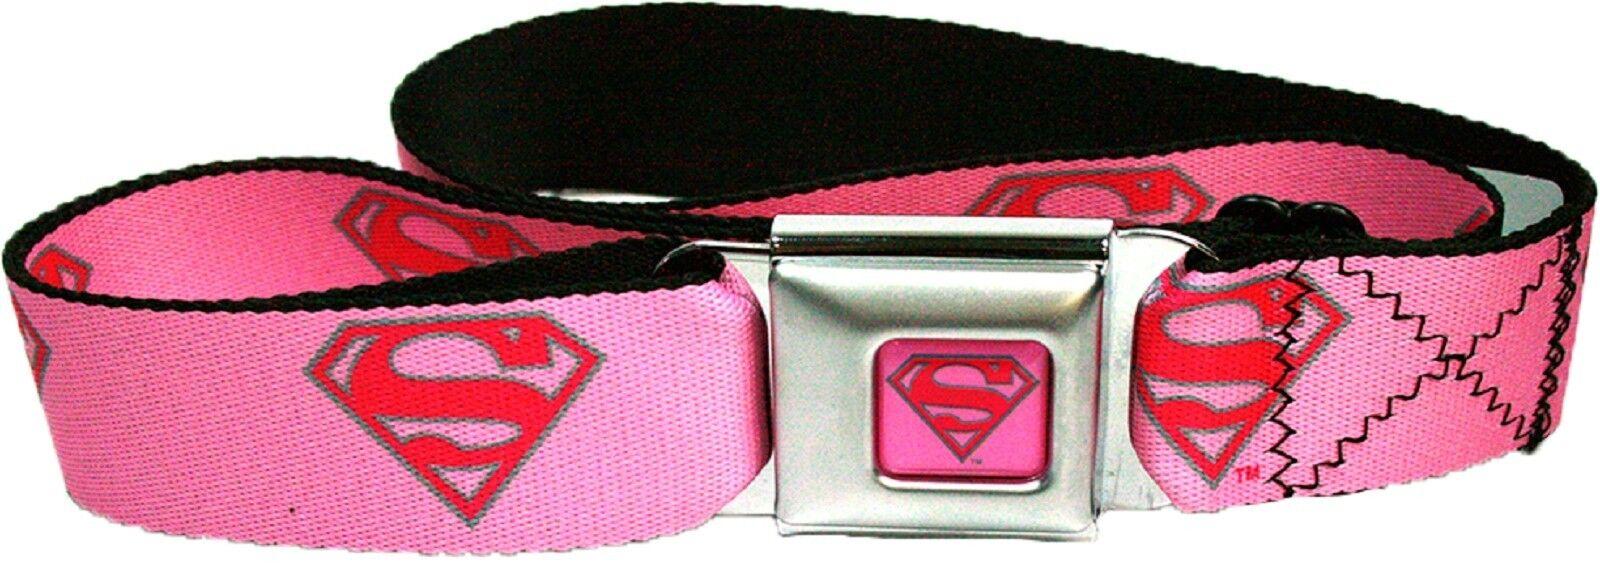 Unisex clothing shoes accs clothing shoes accessories supergirl symbol seatbelt belt dc comics buycottarizona Image collections